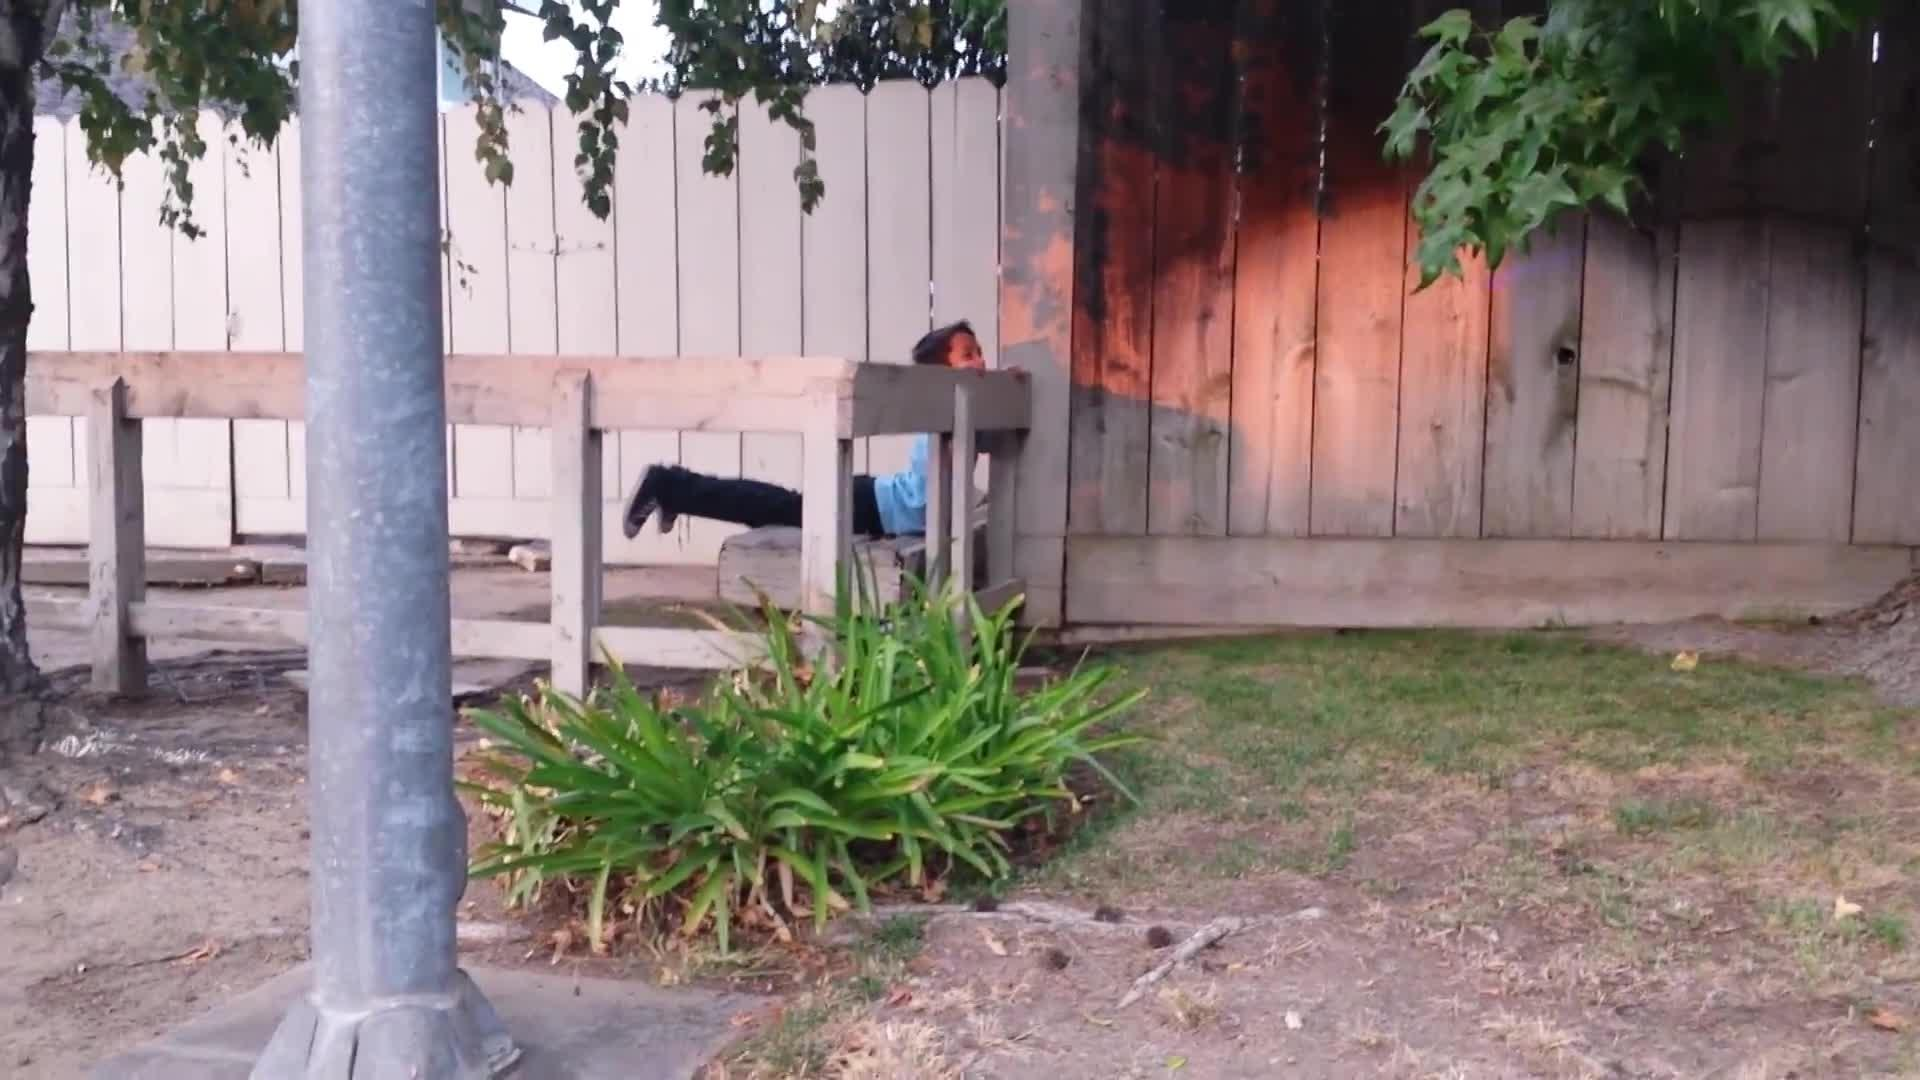 kid jumping fence gets hung up jukin media